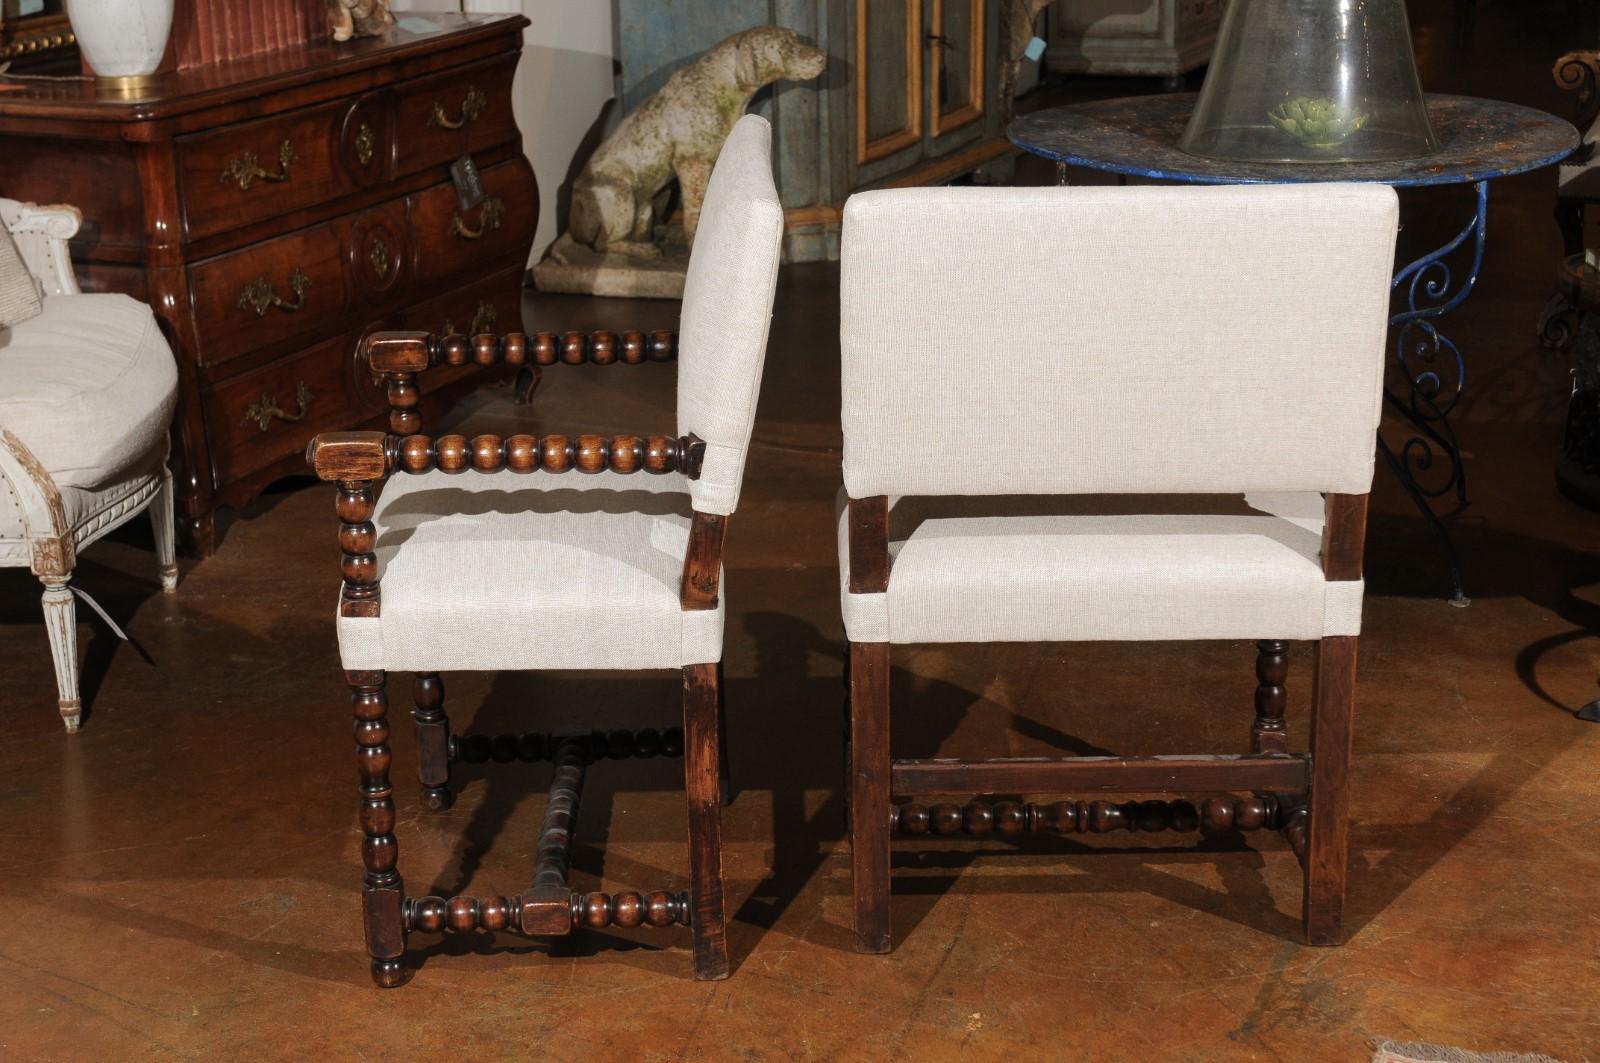 Abp 656 pair of italian baroque style oak armchairs with bobbin legs